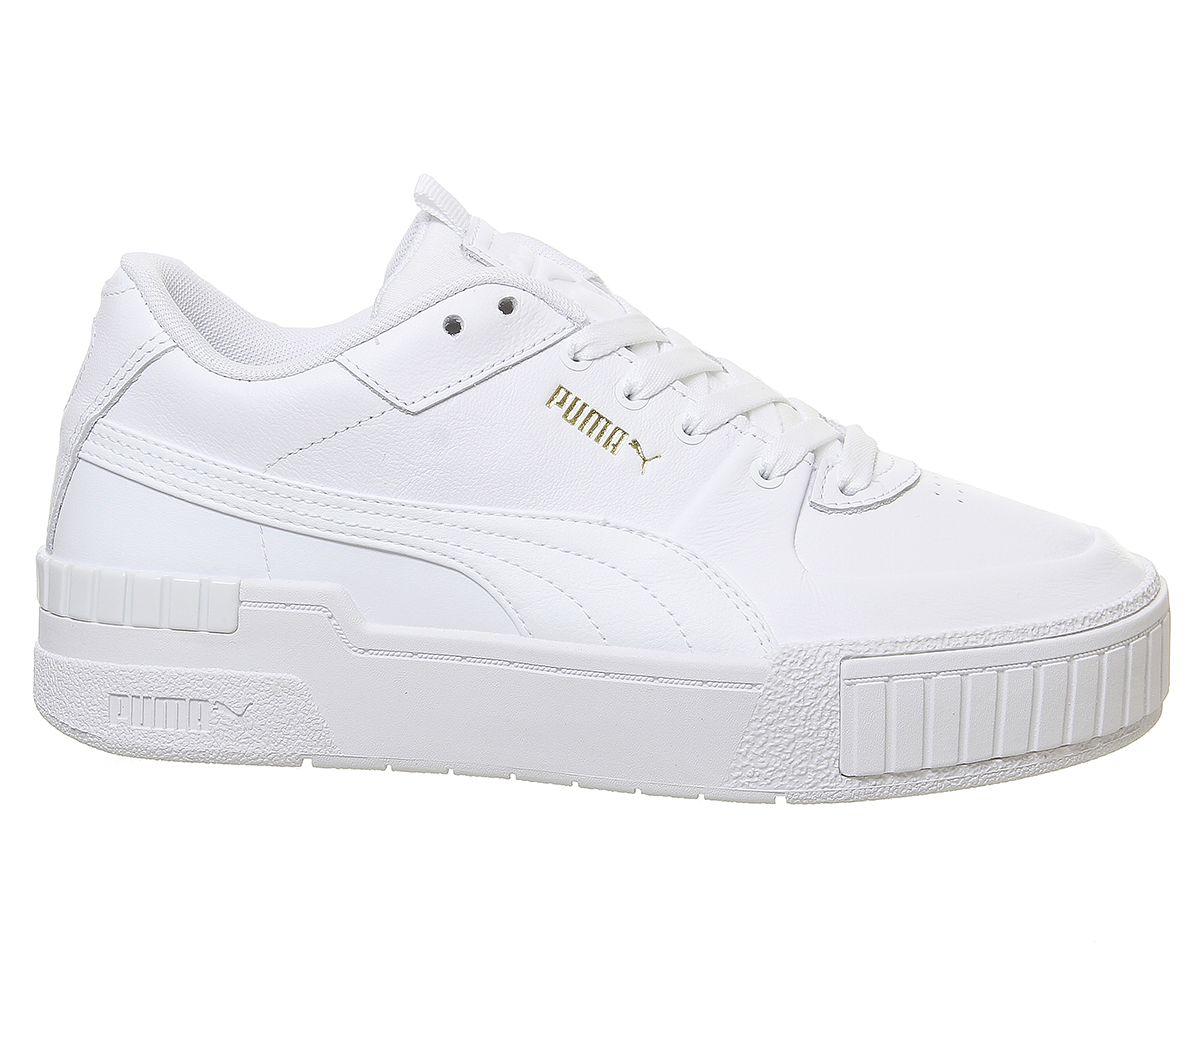 Chaussures-Femme-Puma-Cali-Sport-Baskets-Blanc-Baskets-Chaussures miniature 12